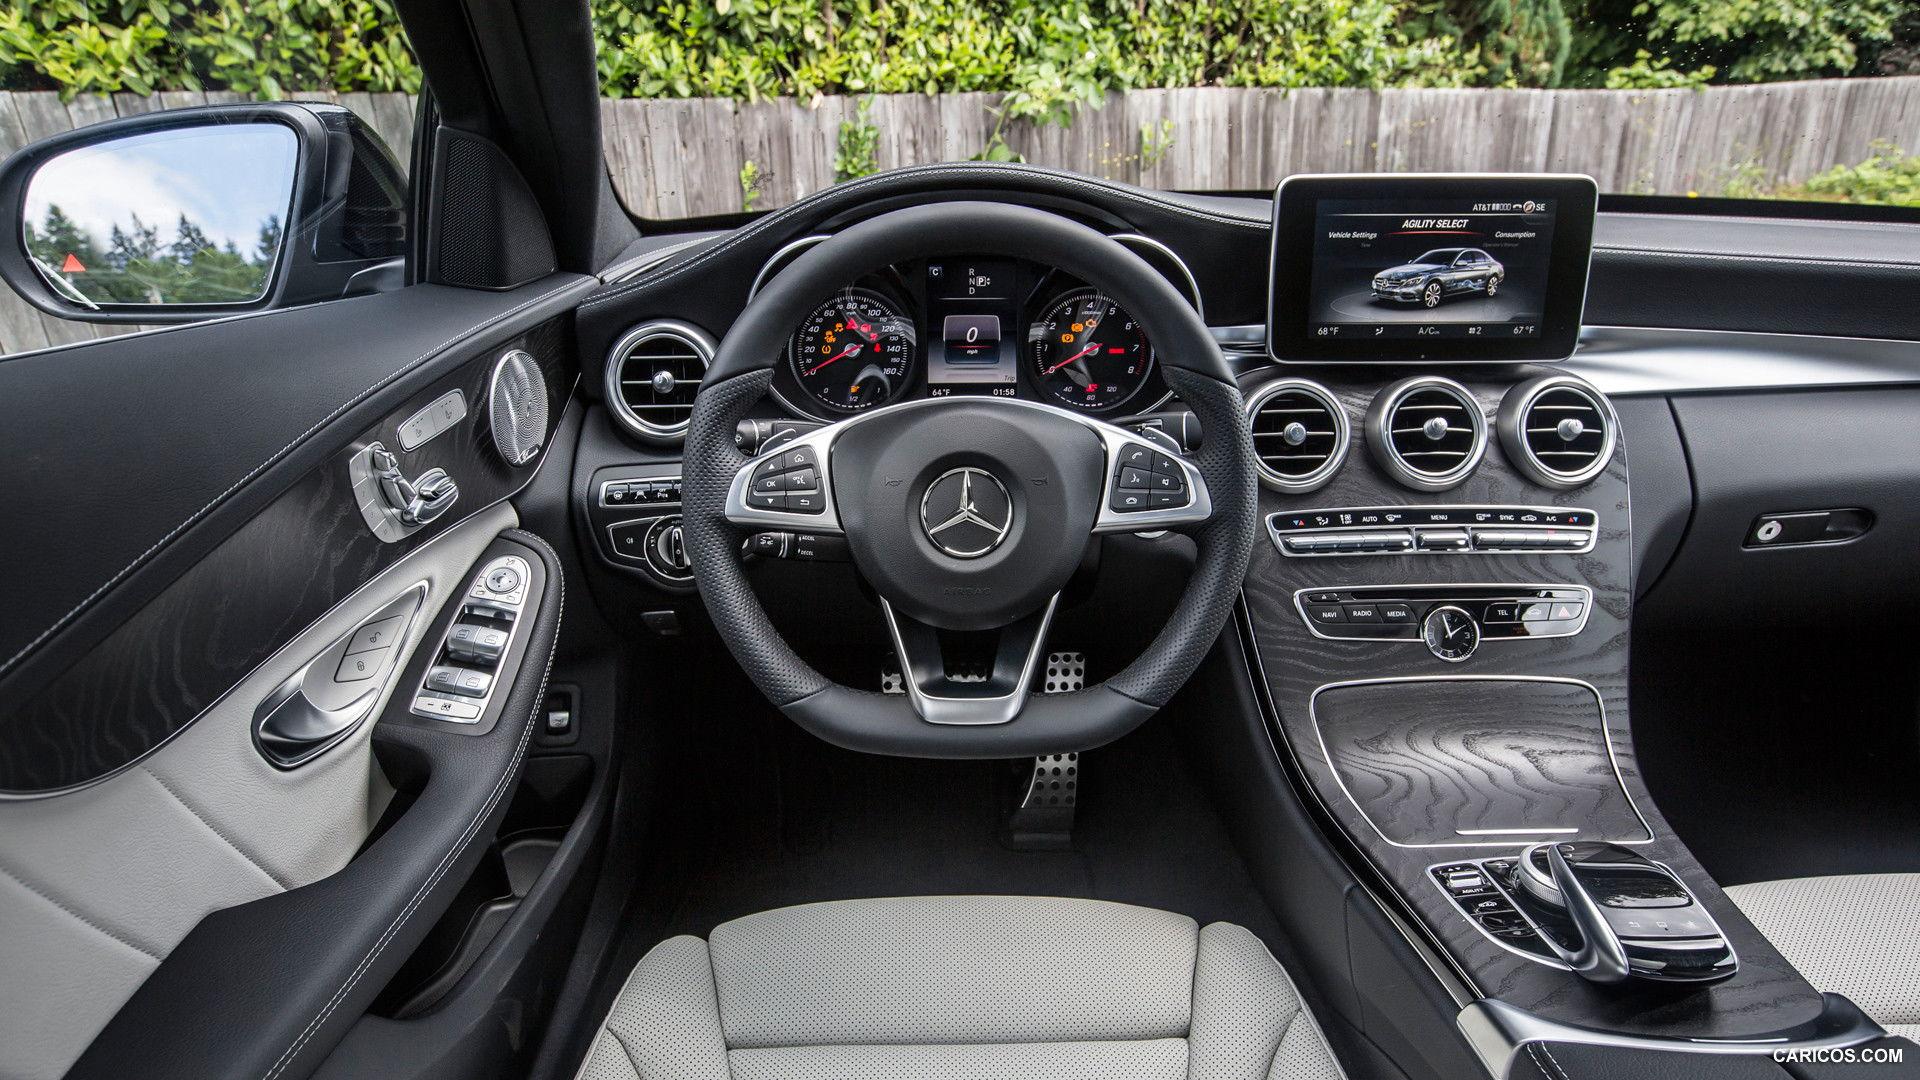 New 2017 a4 vs w205 c class sedan forums for Mercedes benz c class 2015 interior